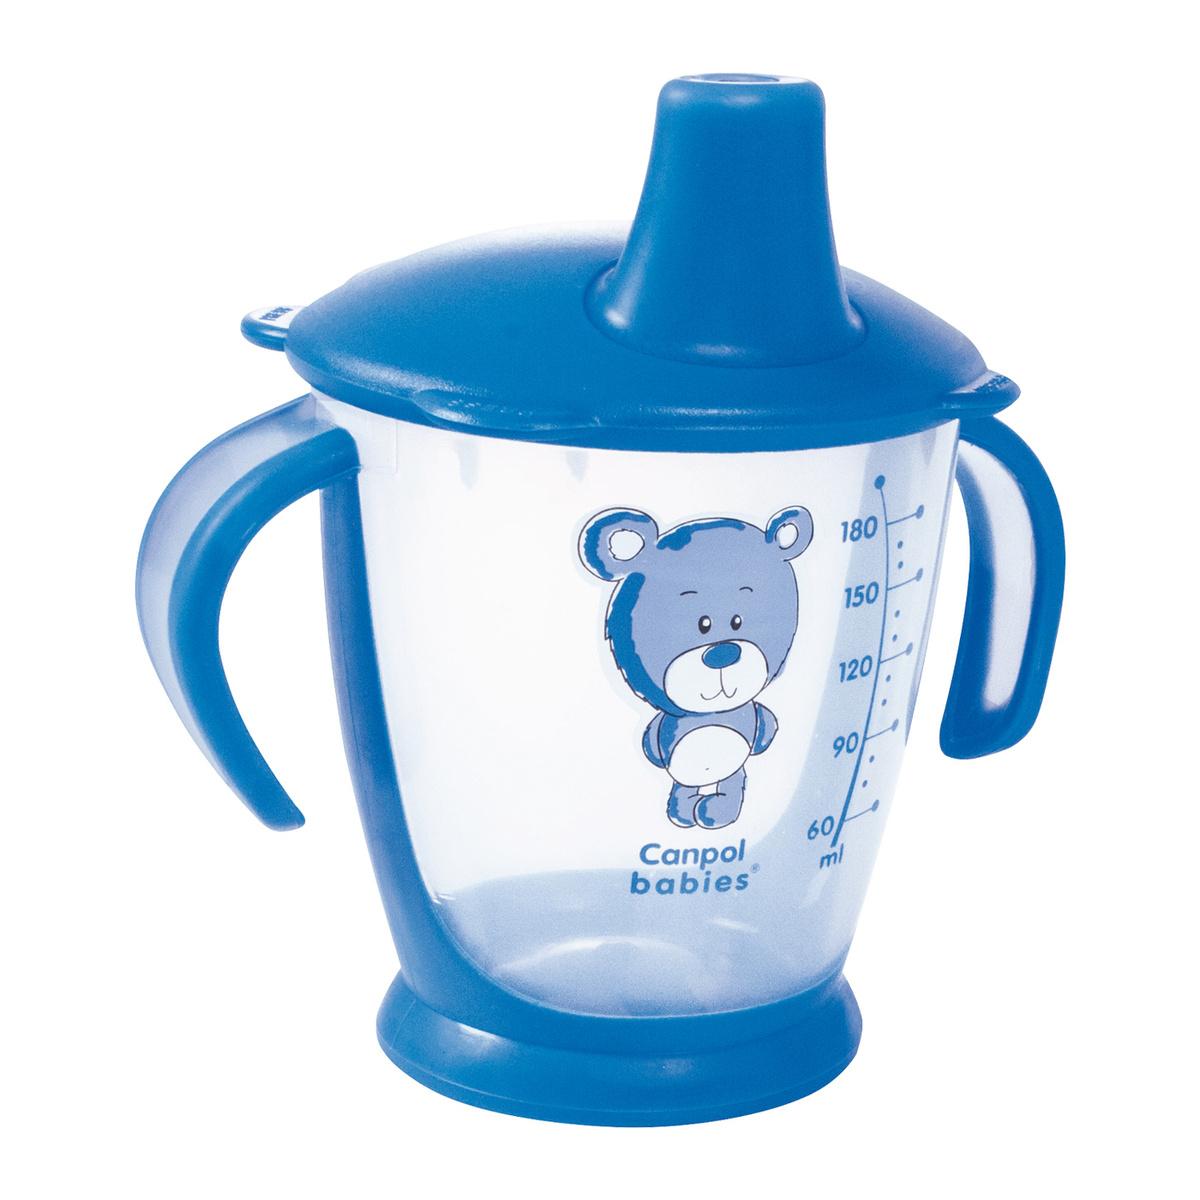 Чашка-непроливайка, Canpol Babies 180 мл. Медвежонок 9+, цвет: синий  #1